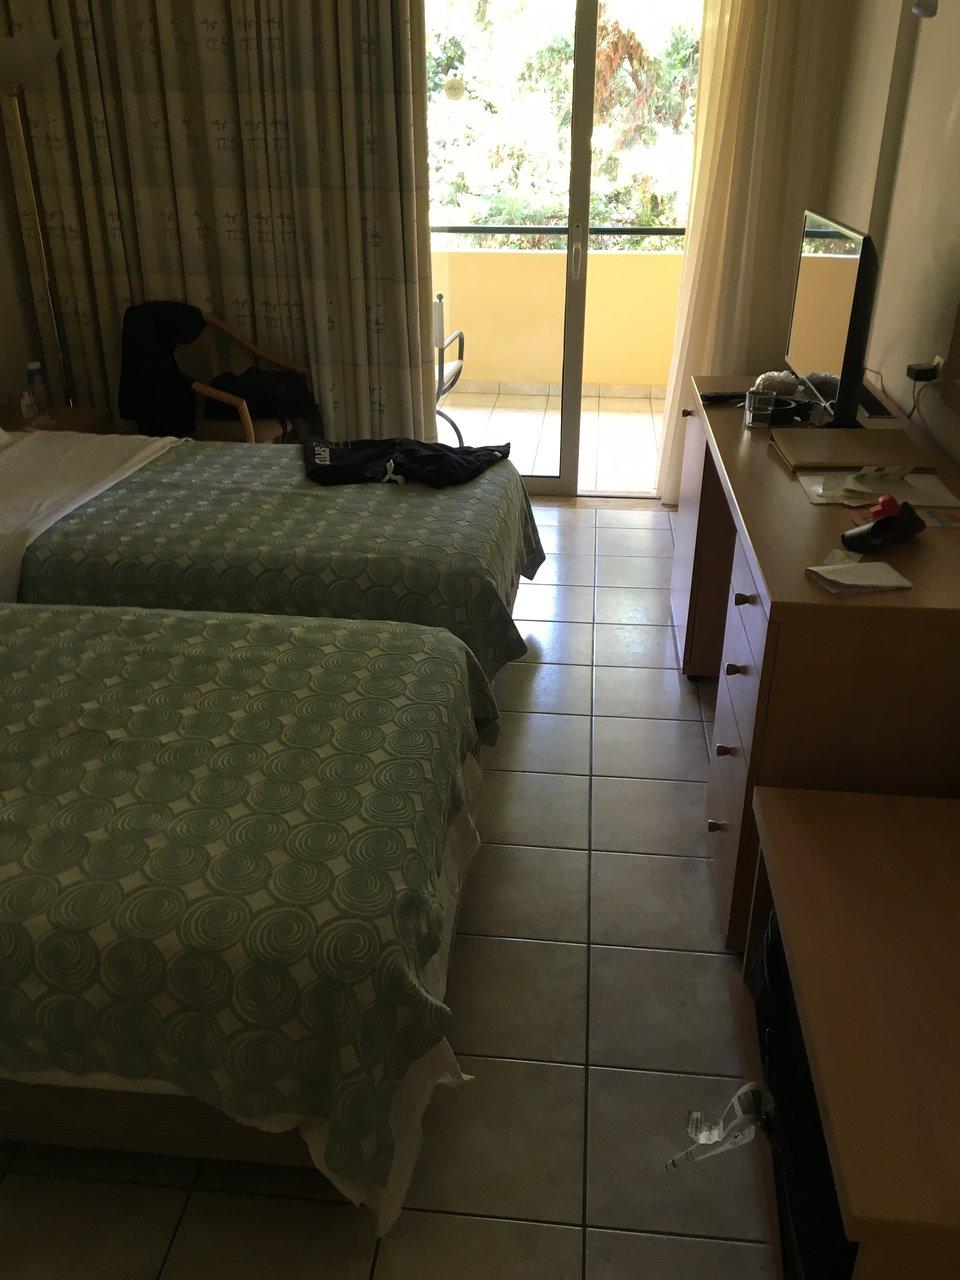 ALKYON RESORT HOTEL u0026 SPA Updated